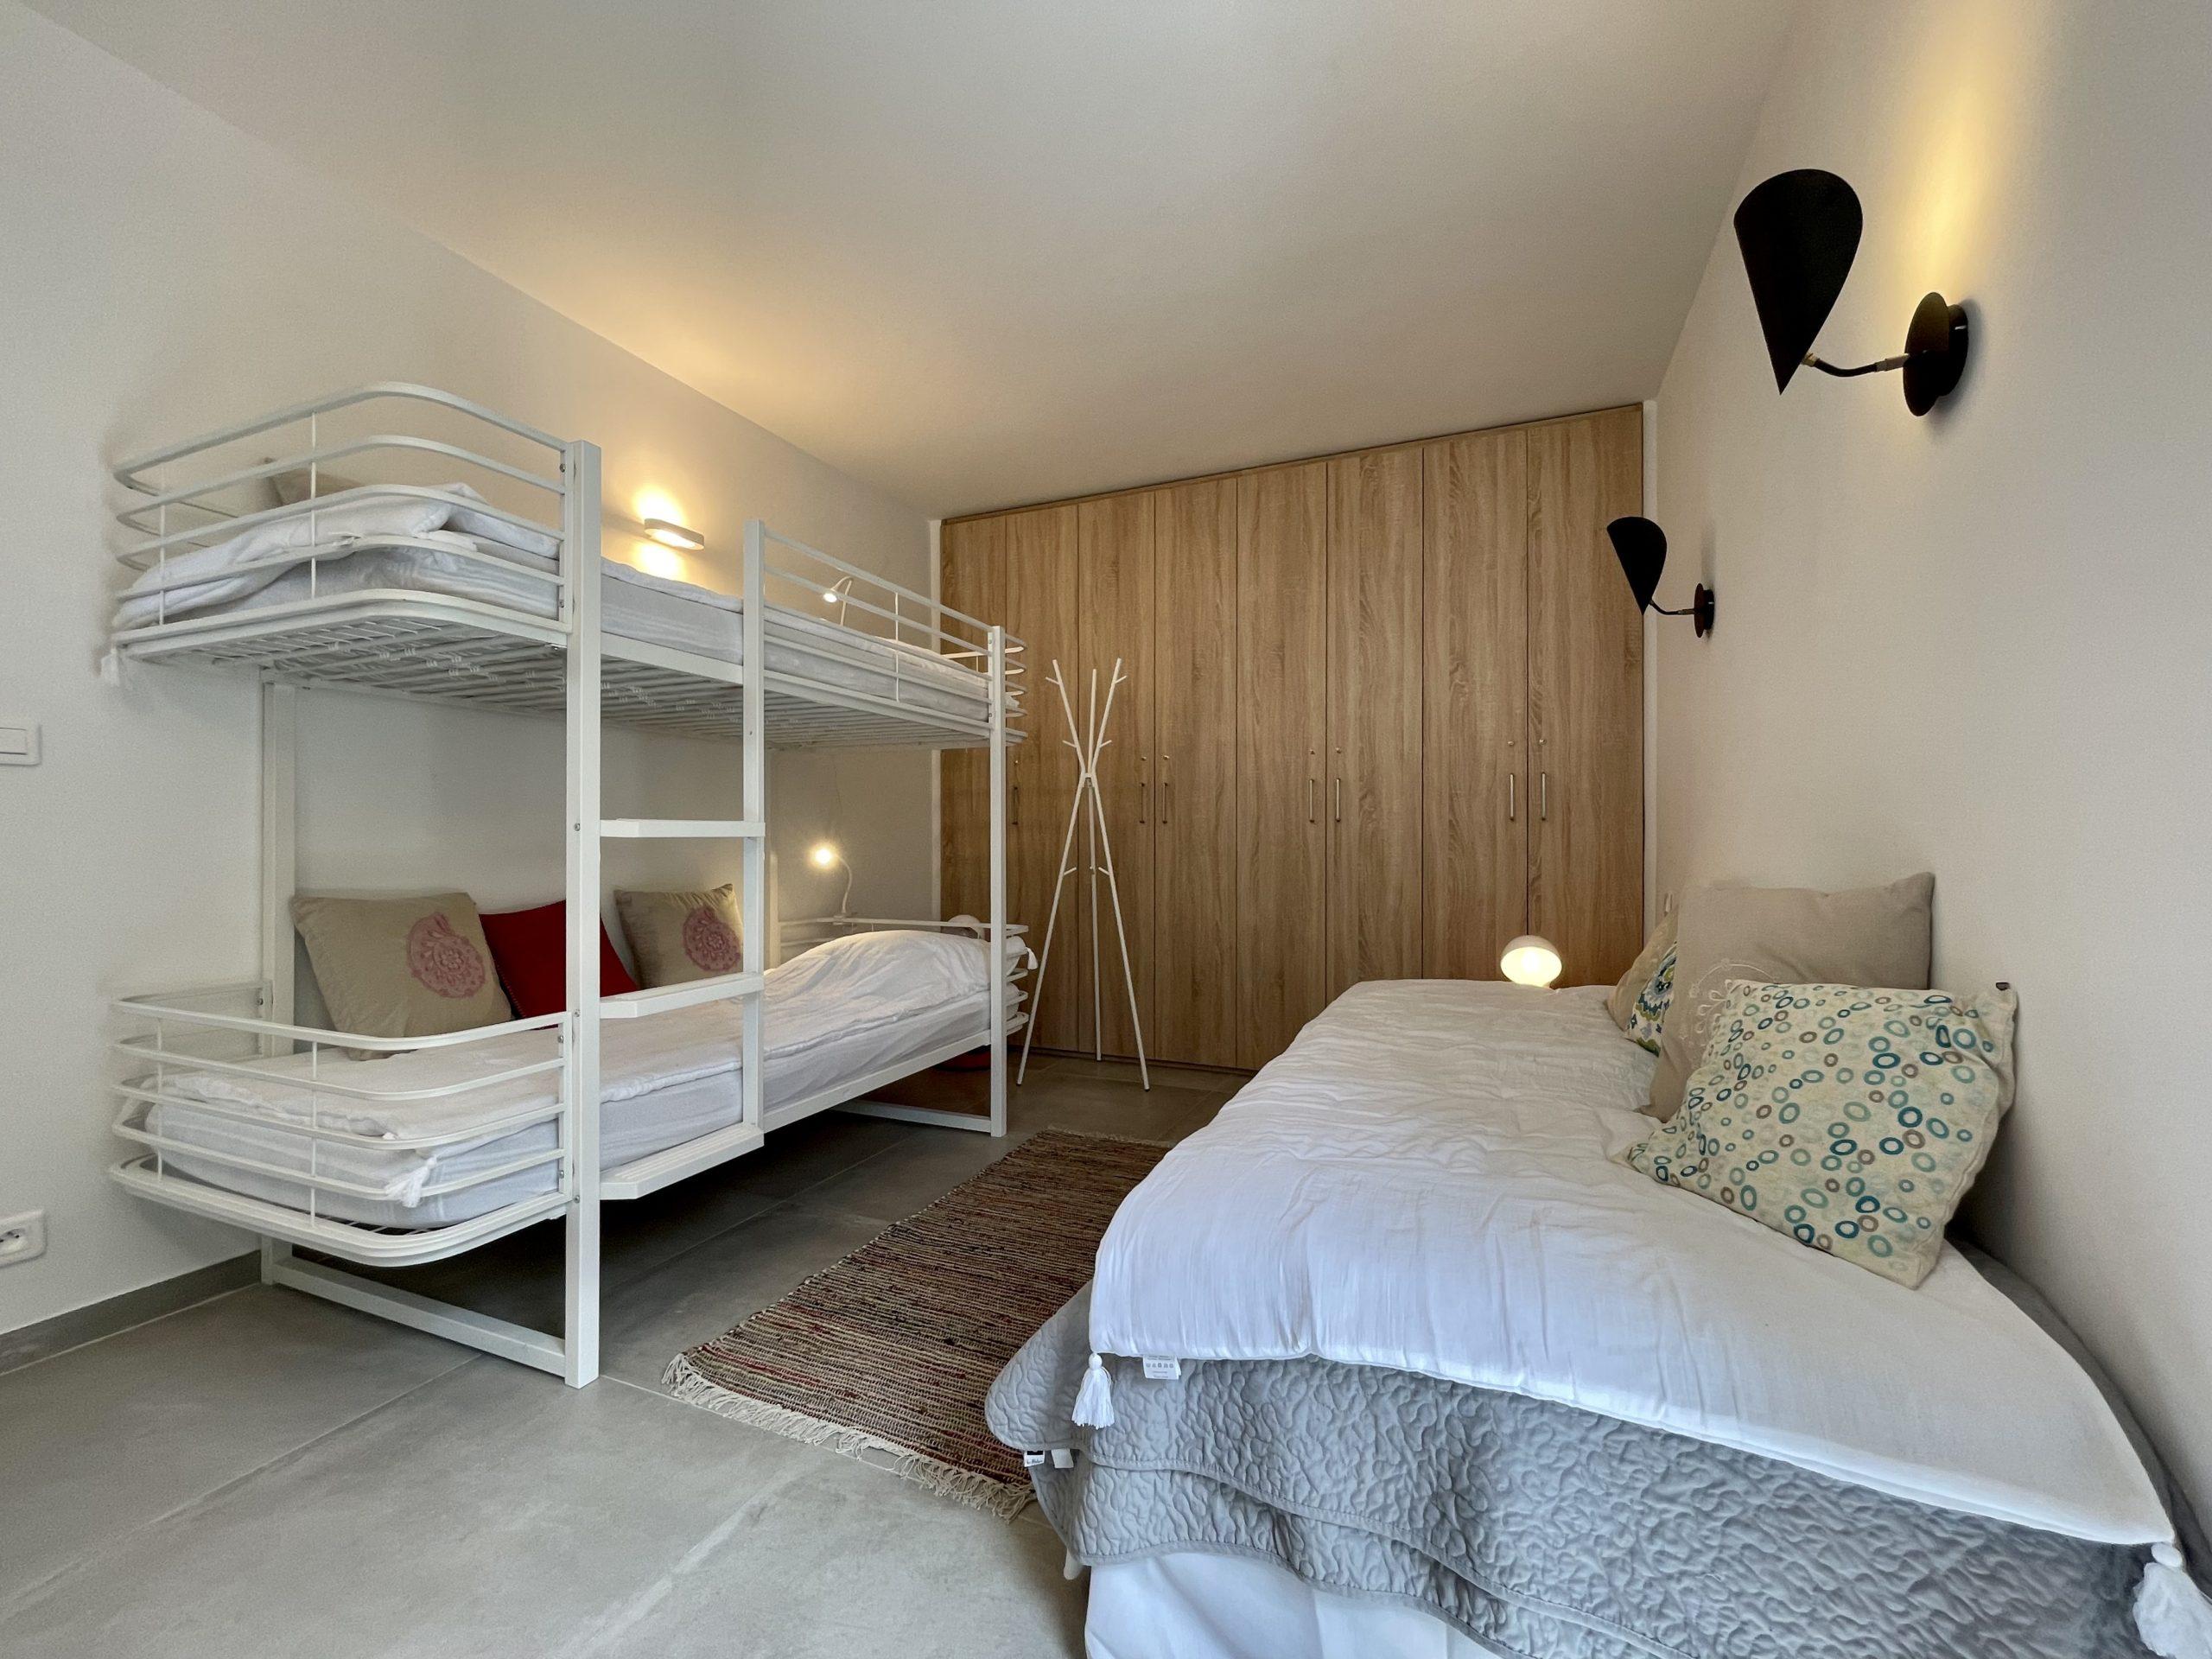 Location villa 5 chambres domaine de Cala Rossa luxe piscine vacances en Corse du sud Porto-Vecchio vue mer moderne contemporaine villa luxe